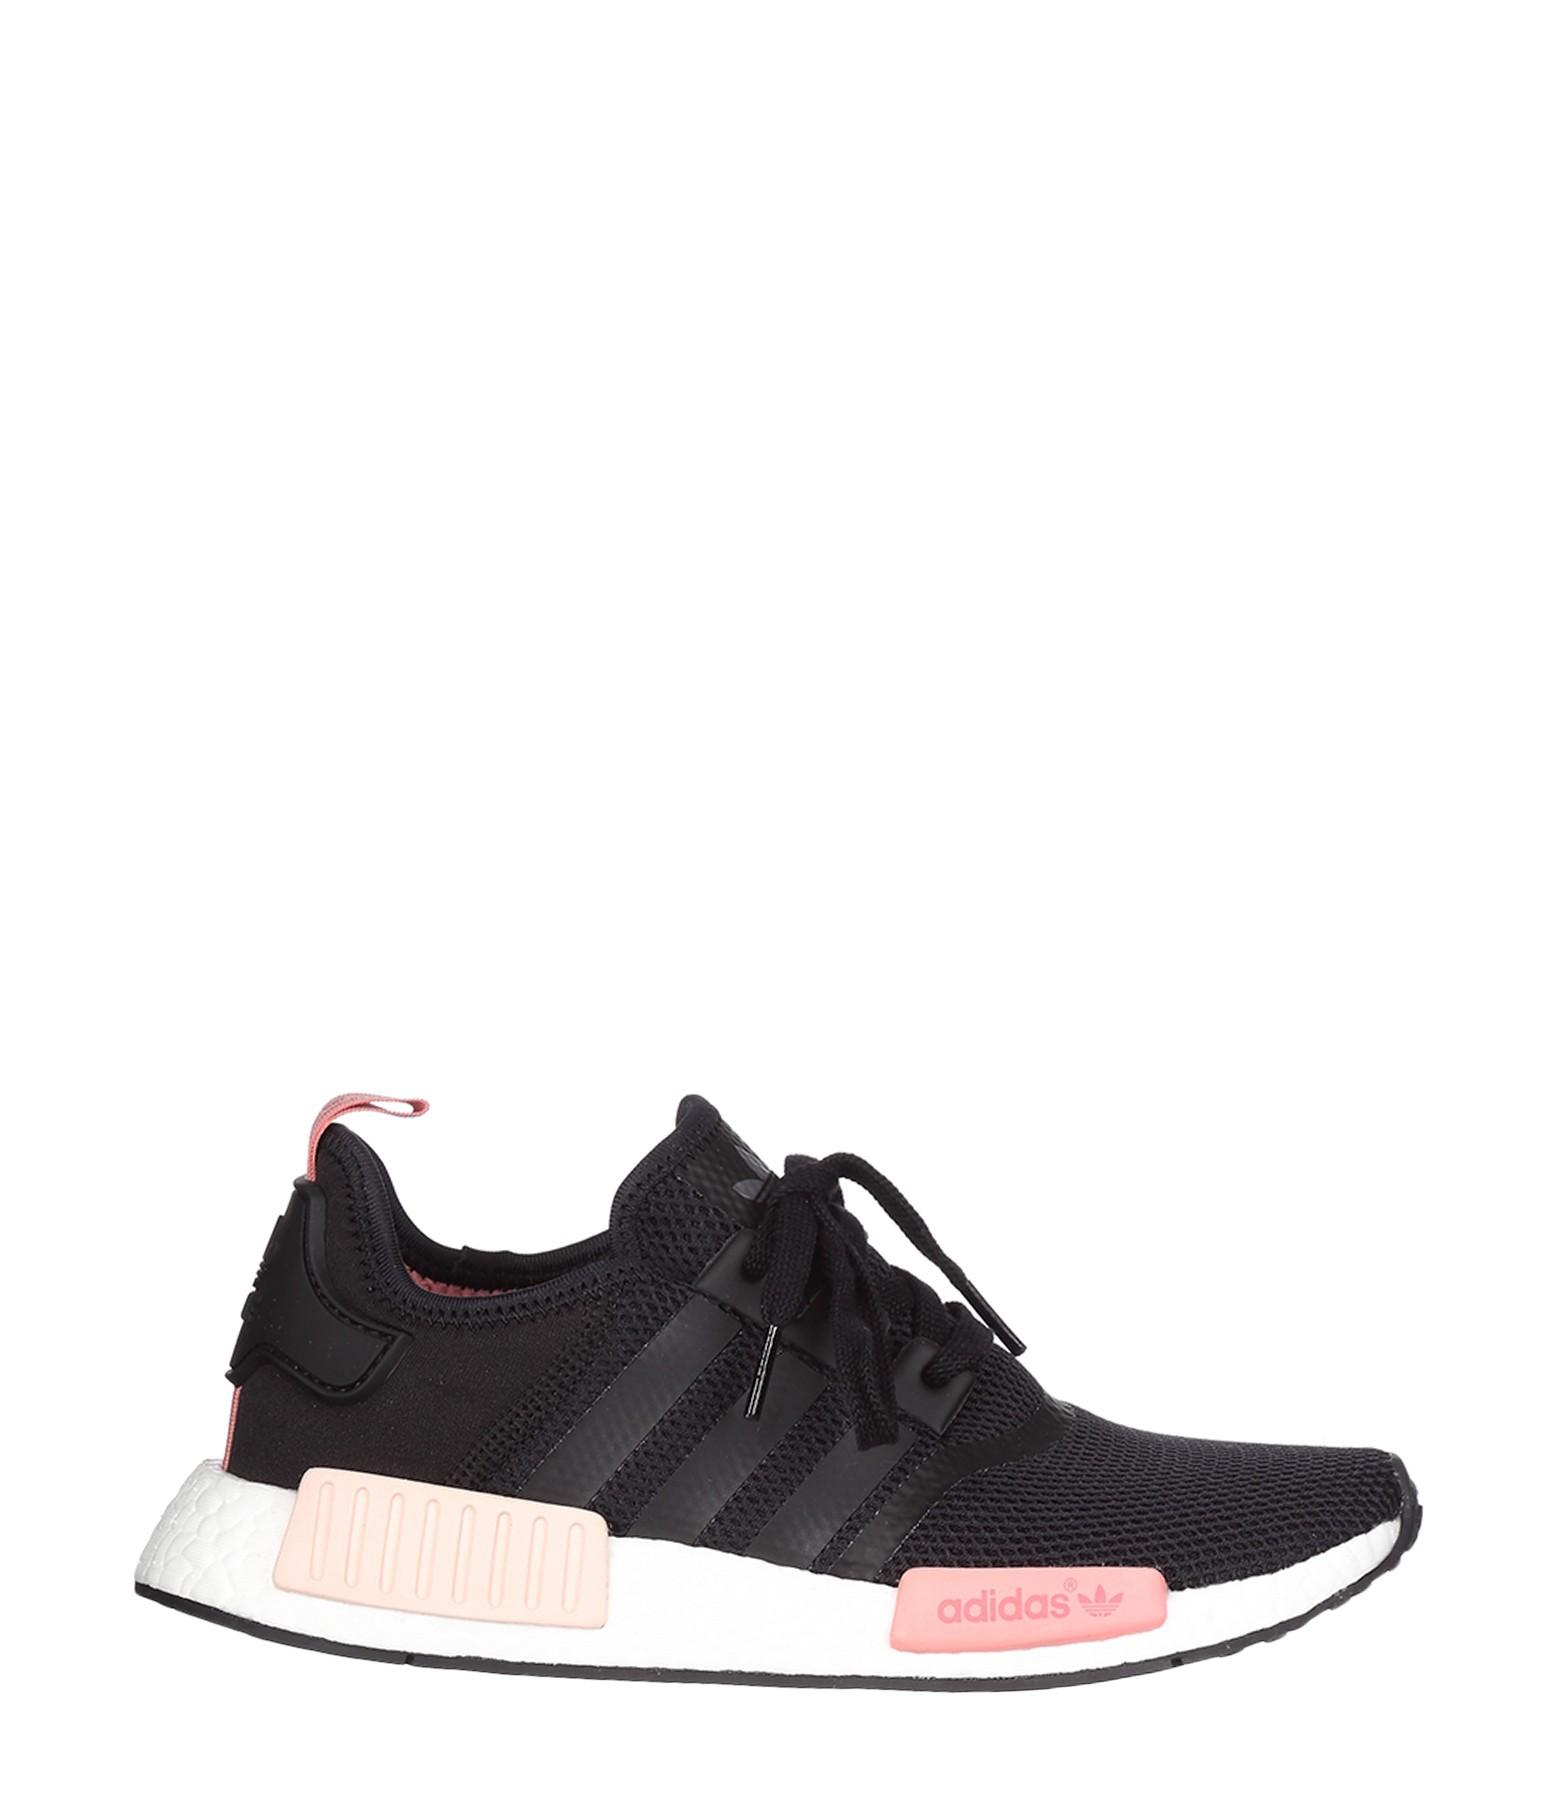 adidas nmd noir